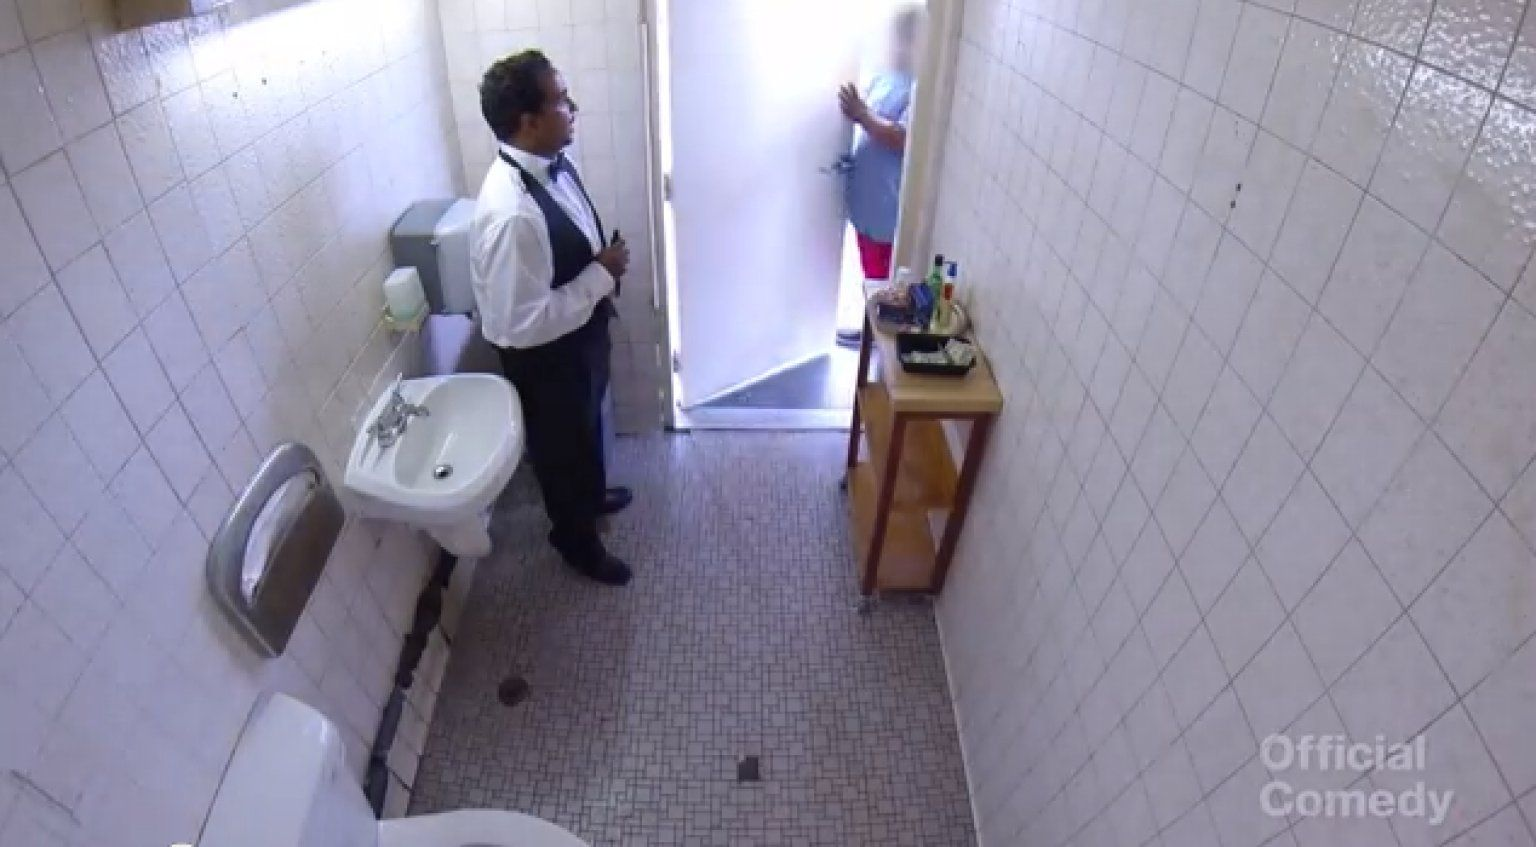 Japanese bathroom pranks